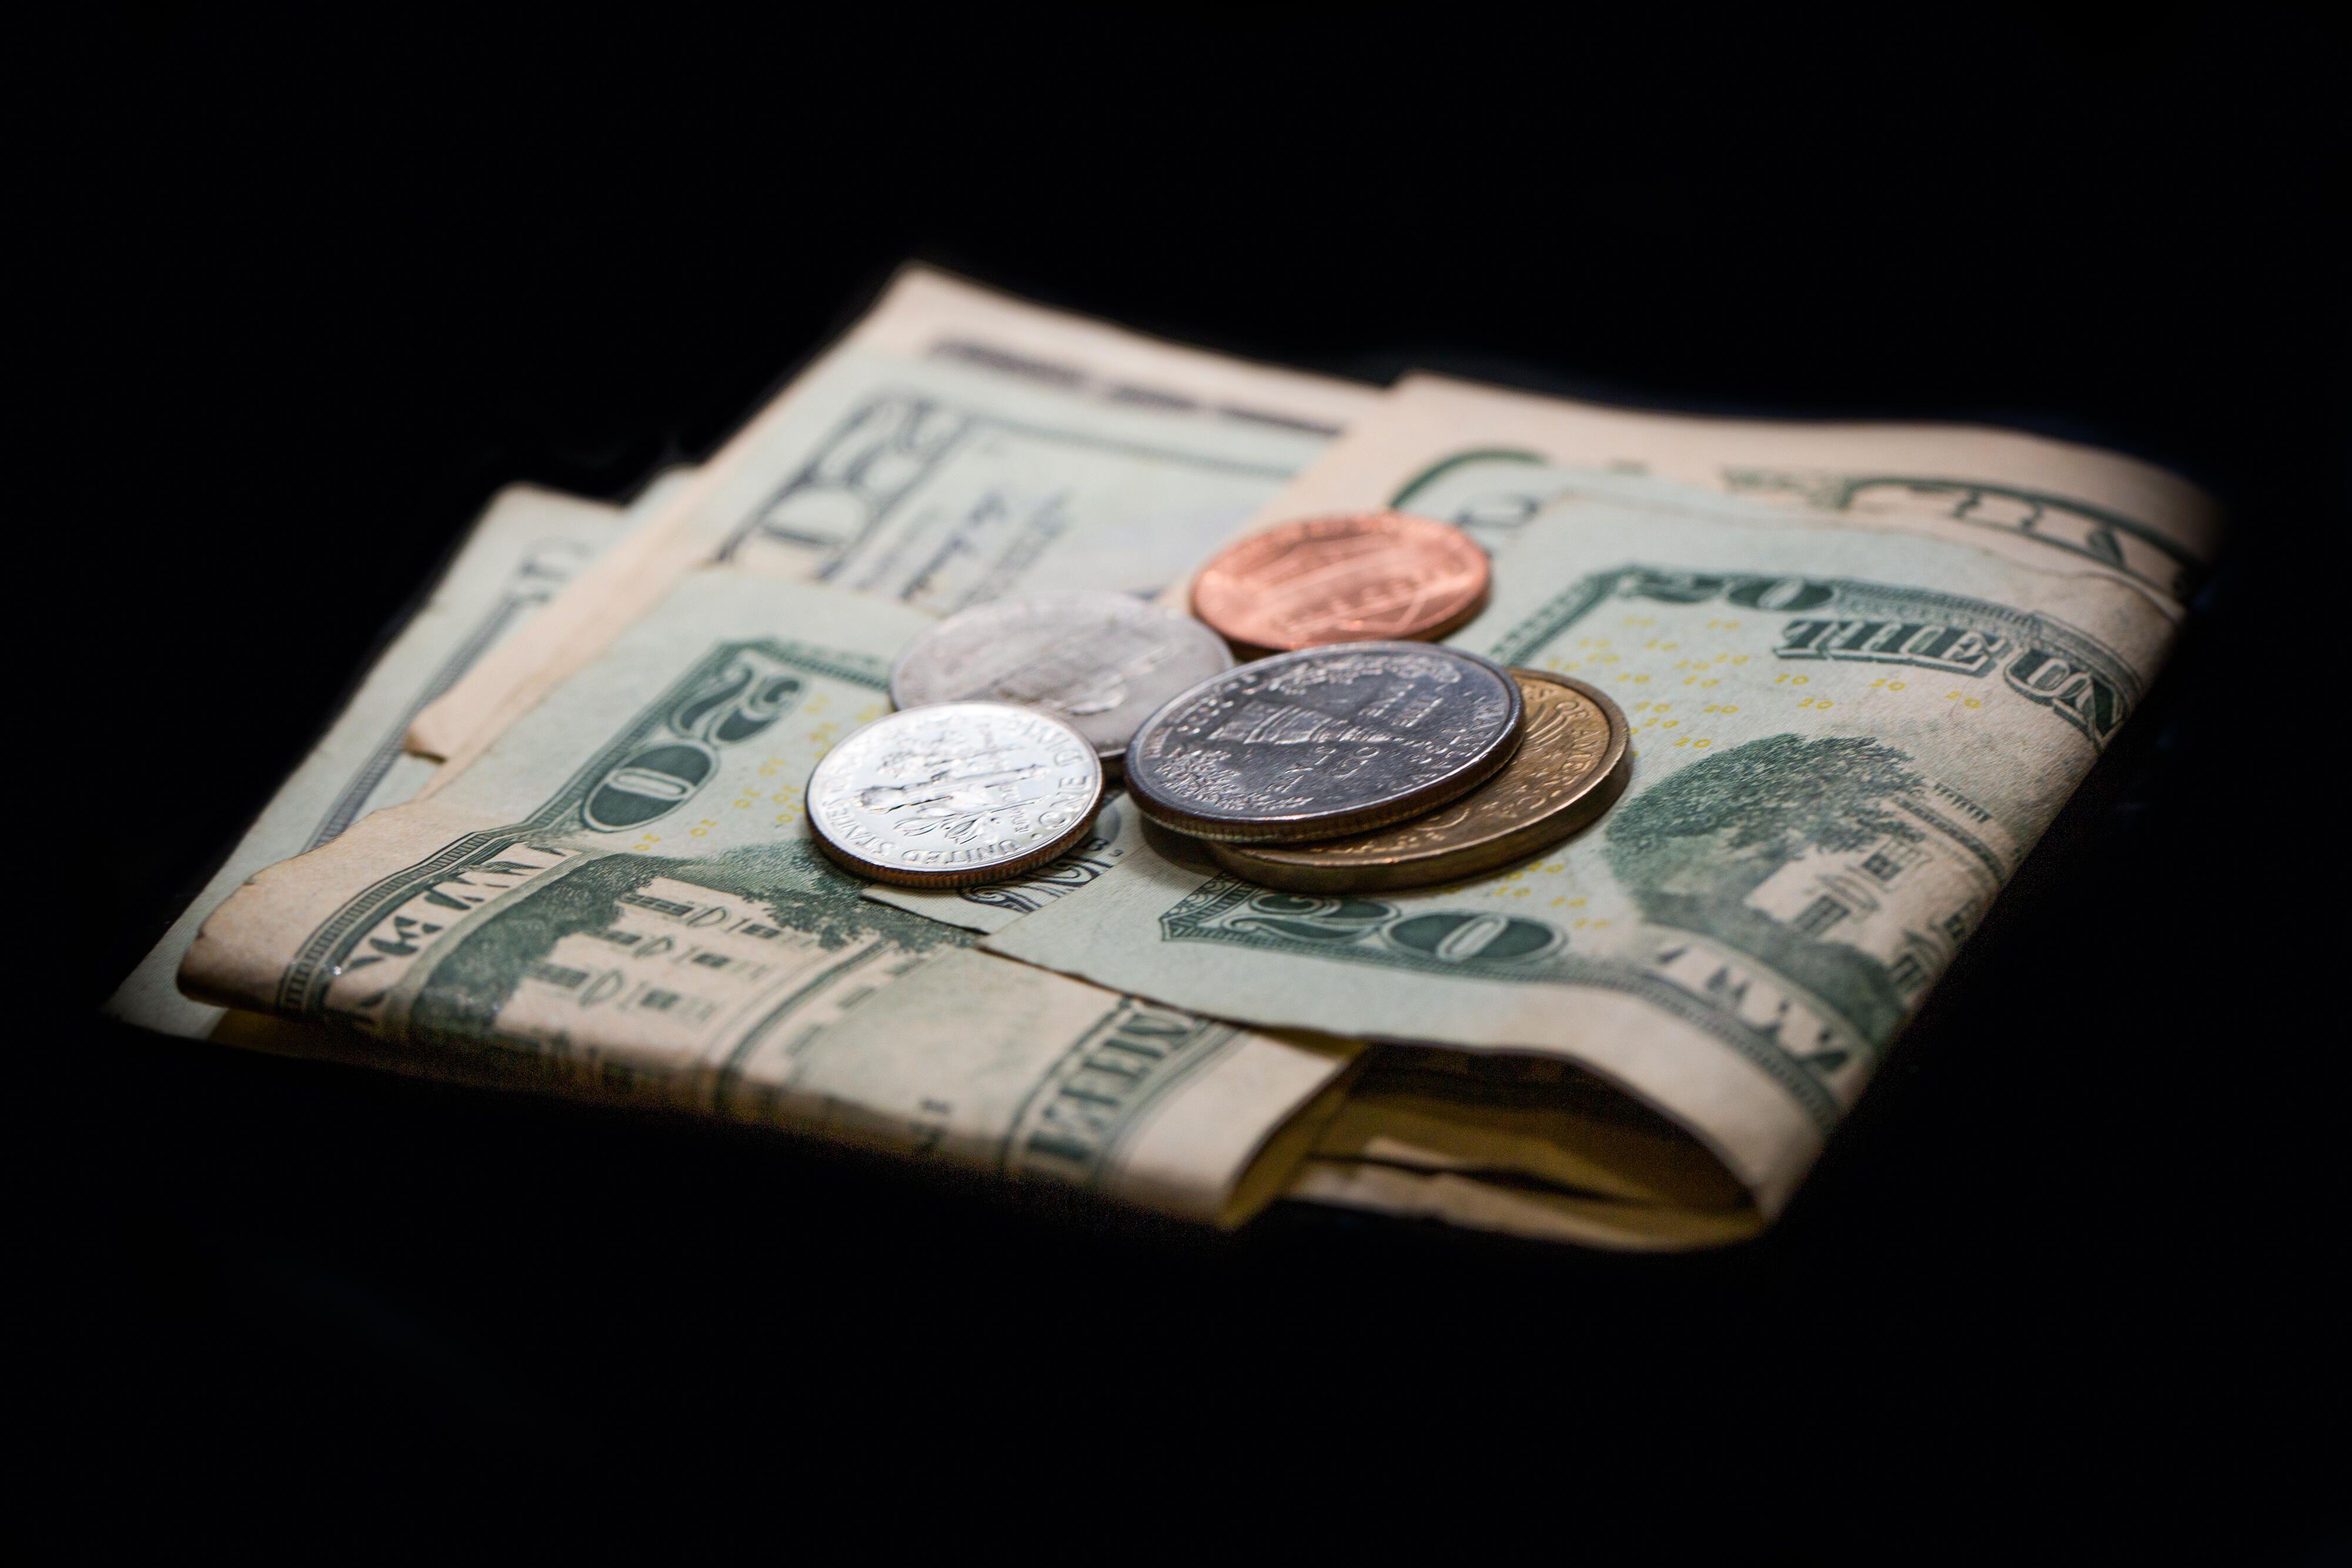 money-bills-wallet-coins-dollars-2